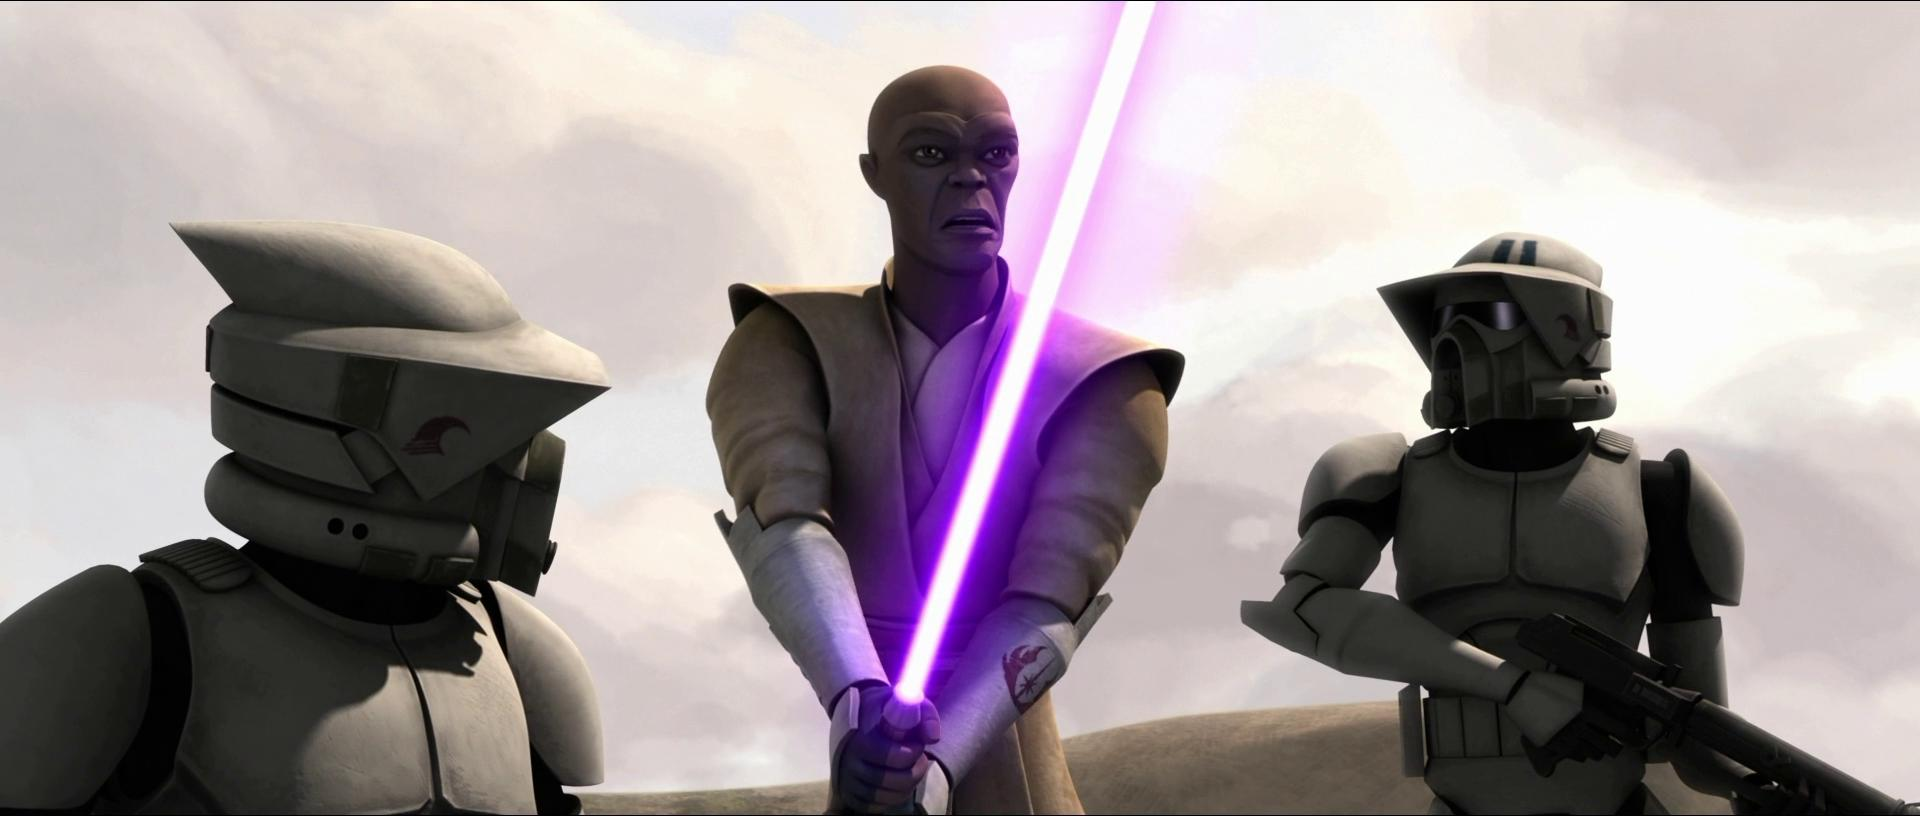 Star Wars The Clone Wars Liberty on Ryloth TV Episode 2009   IMDb 1920x816